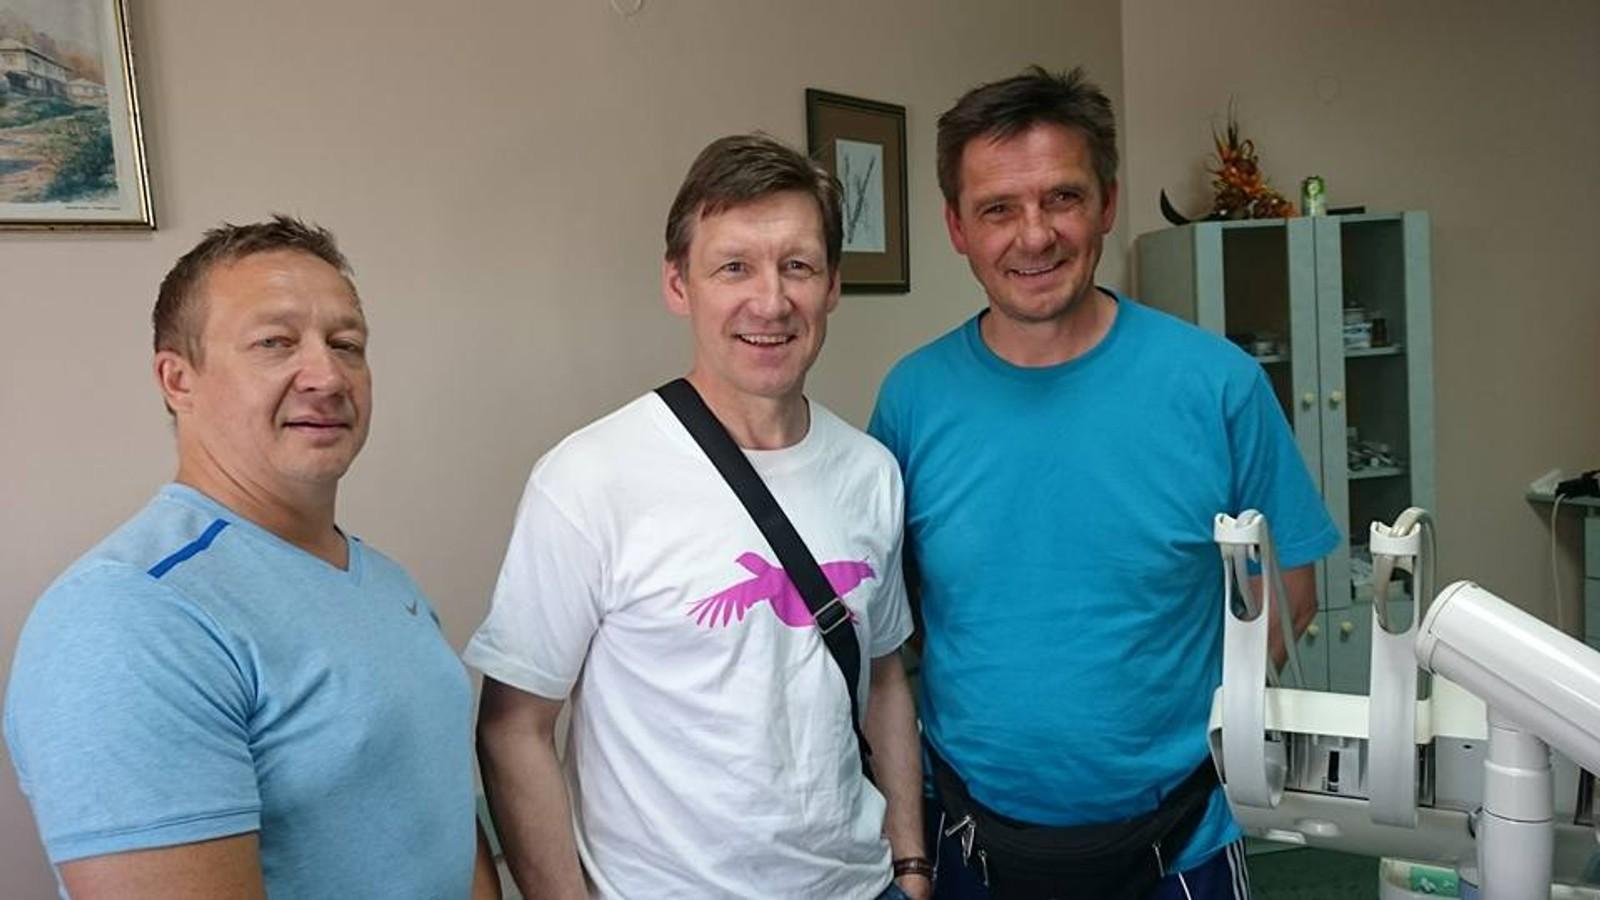 Isak Ole Hætta (I midten) sammen med Jan Olav Guttorm (t.h.) og Tor Gunnar Nystad.